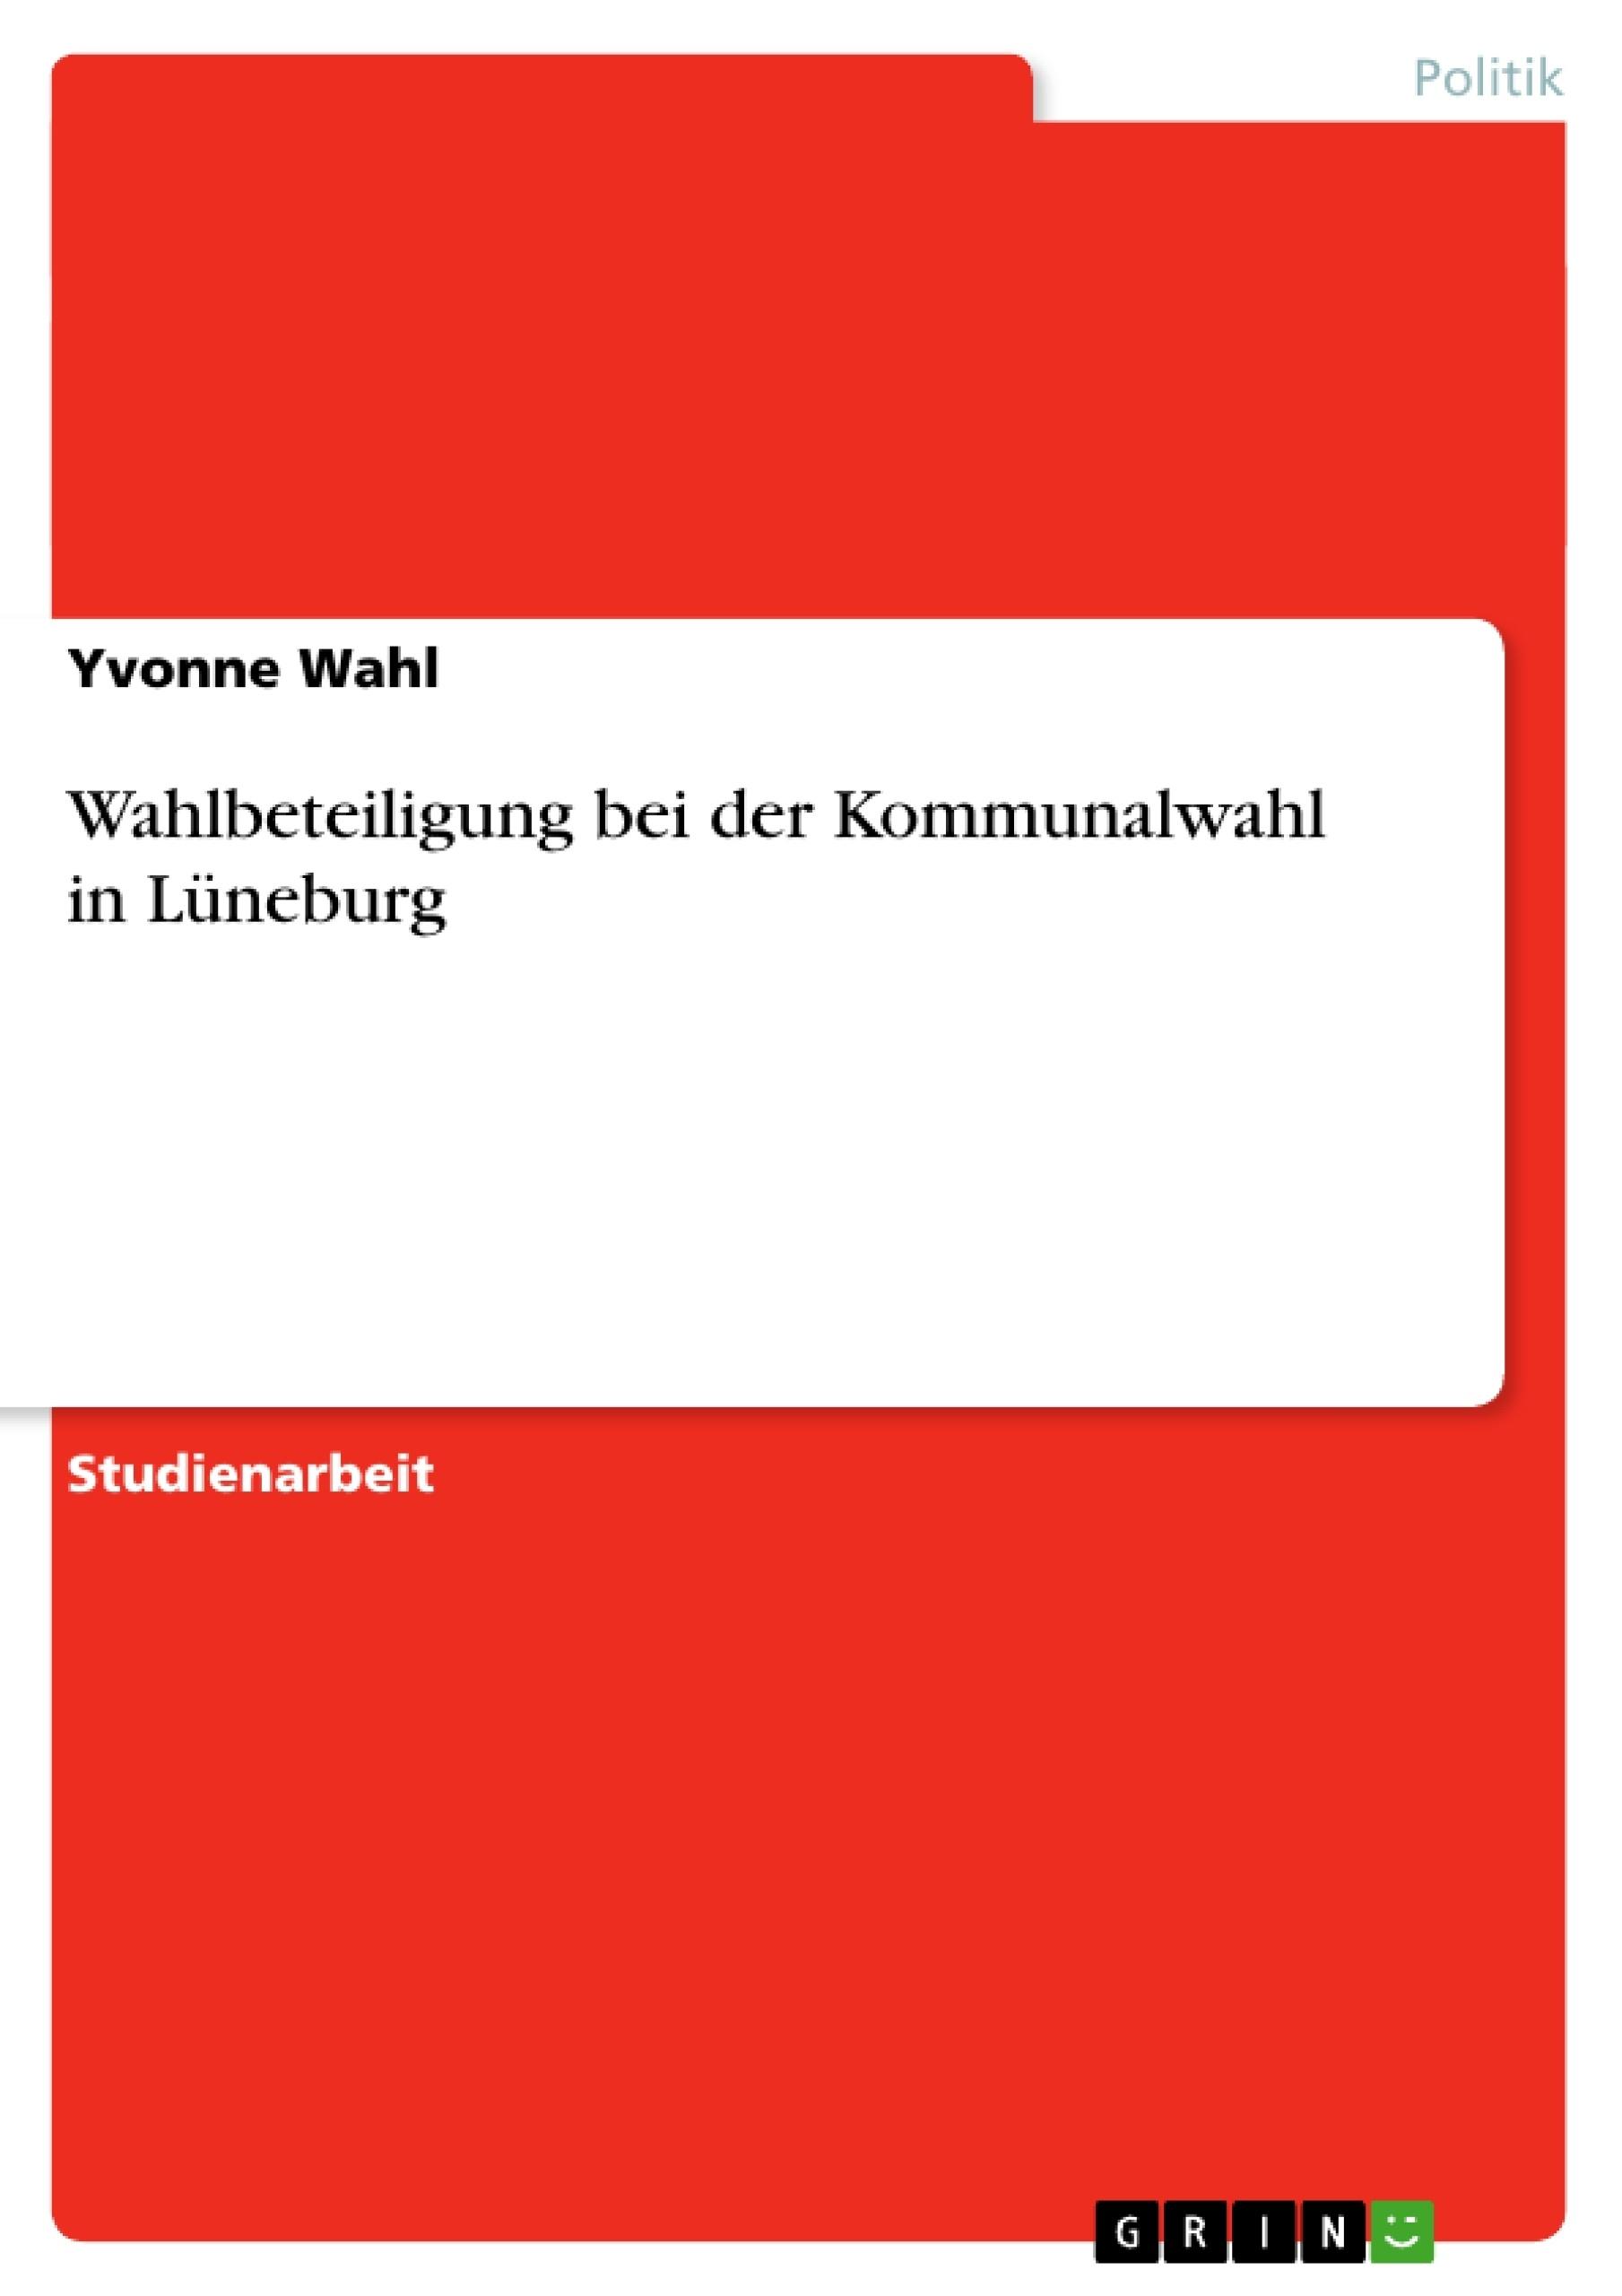 Titel: Wahlbeteiligung bei der Kommunalwahl in Lüneburg